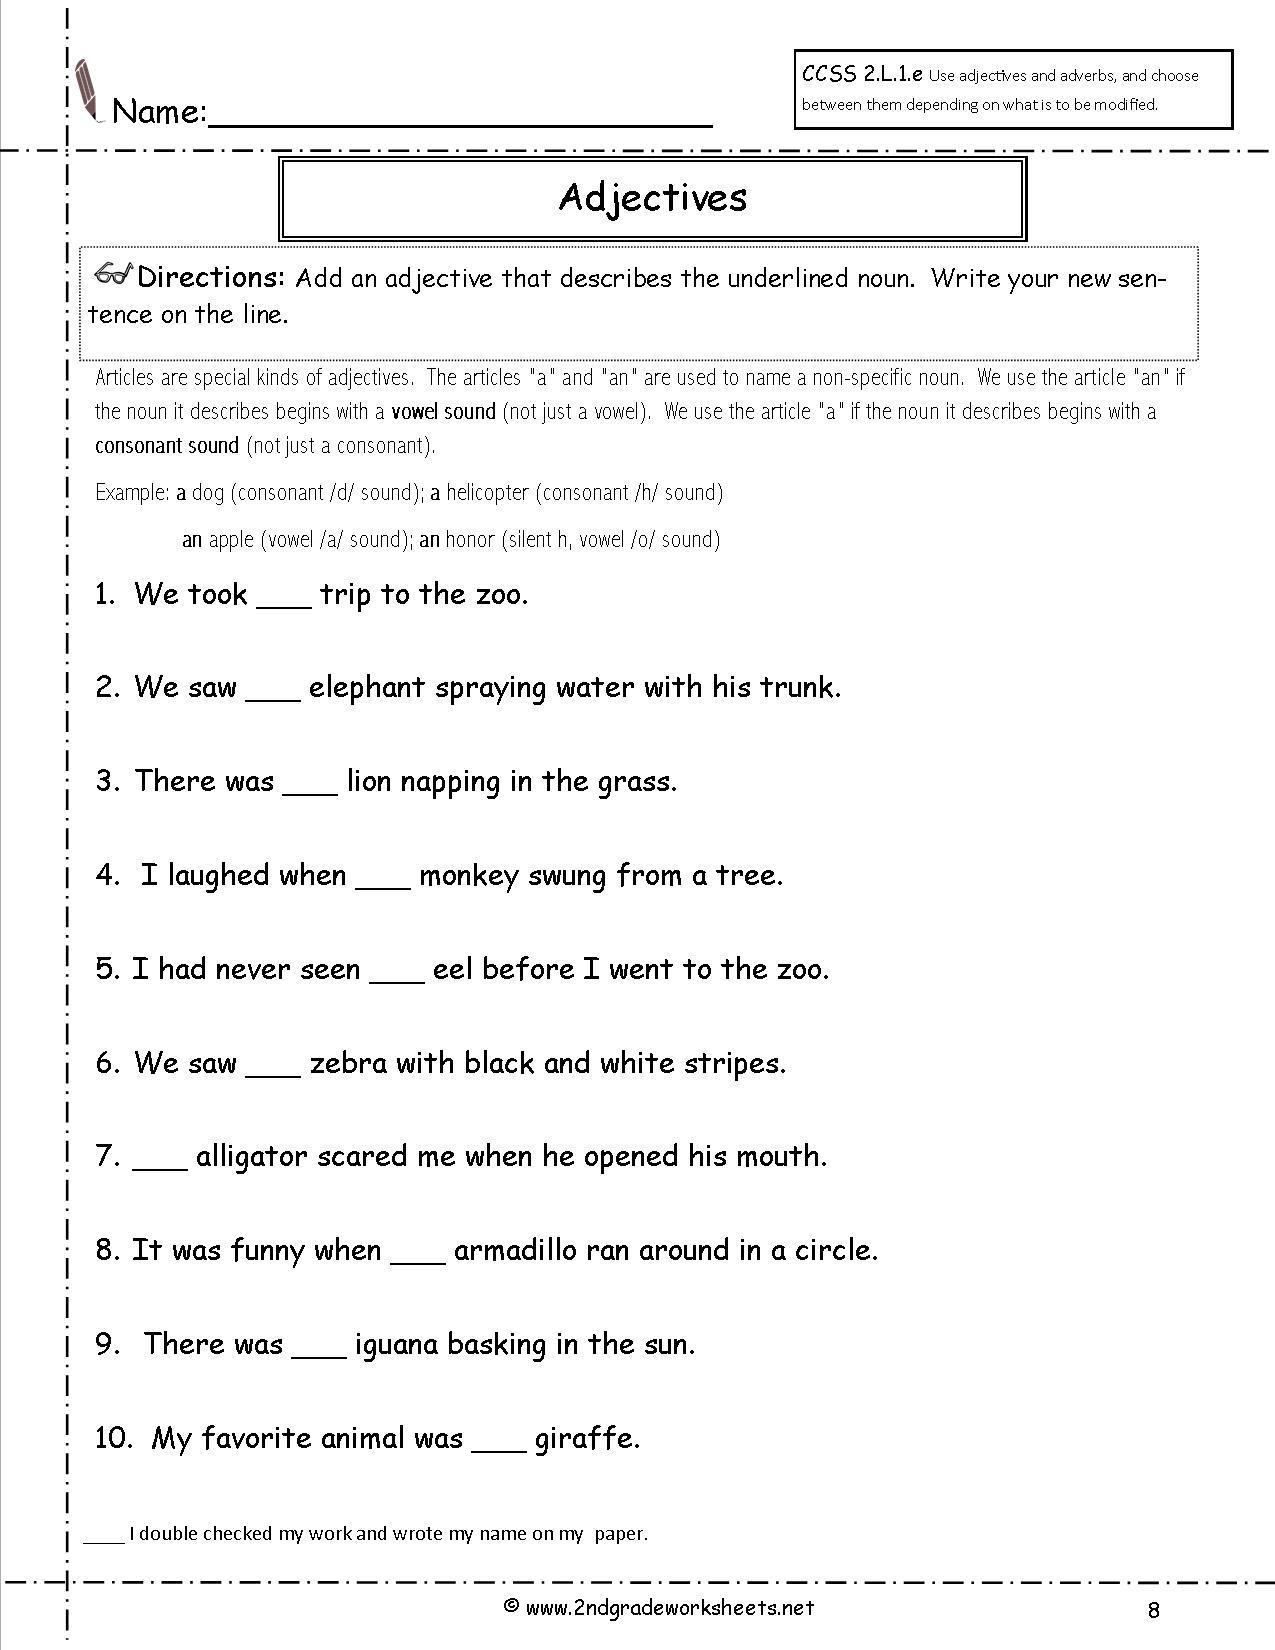 Free Language/grammar Worksheets And Printouts | 3Rd Grade Grammar Free Printable Worksheets